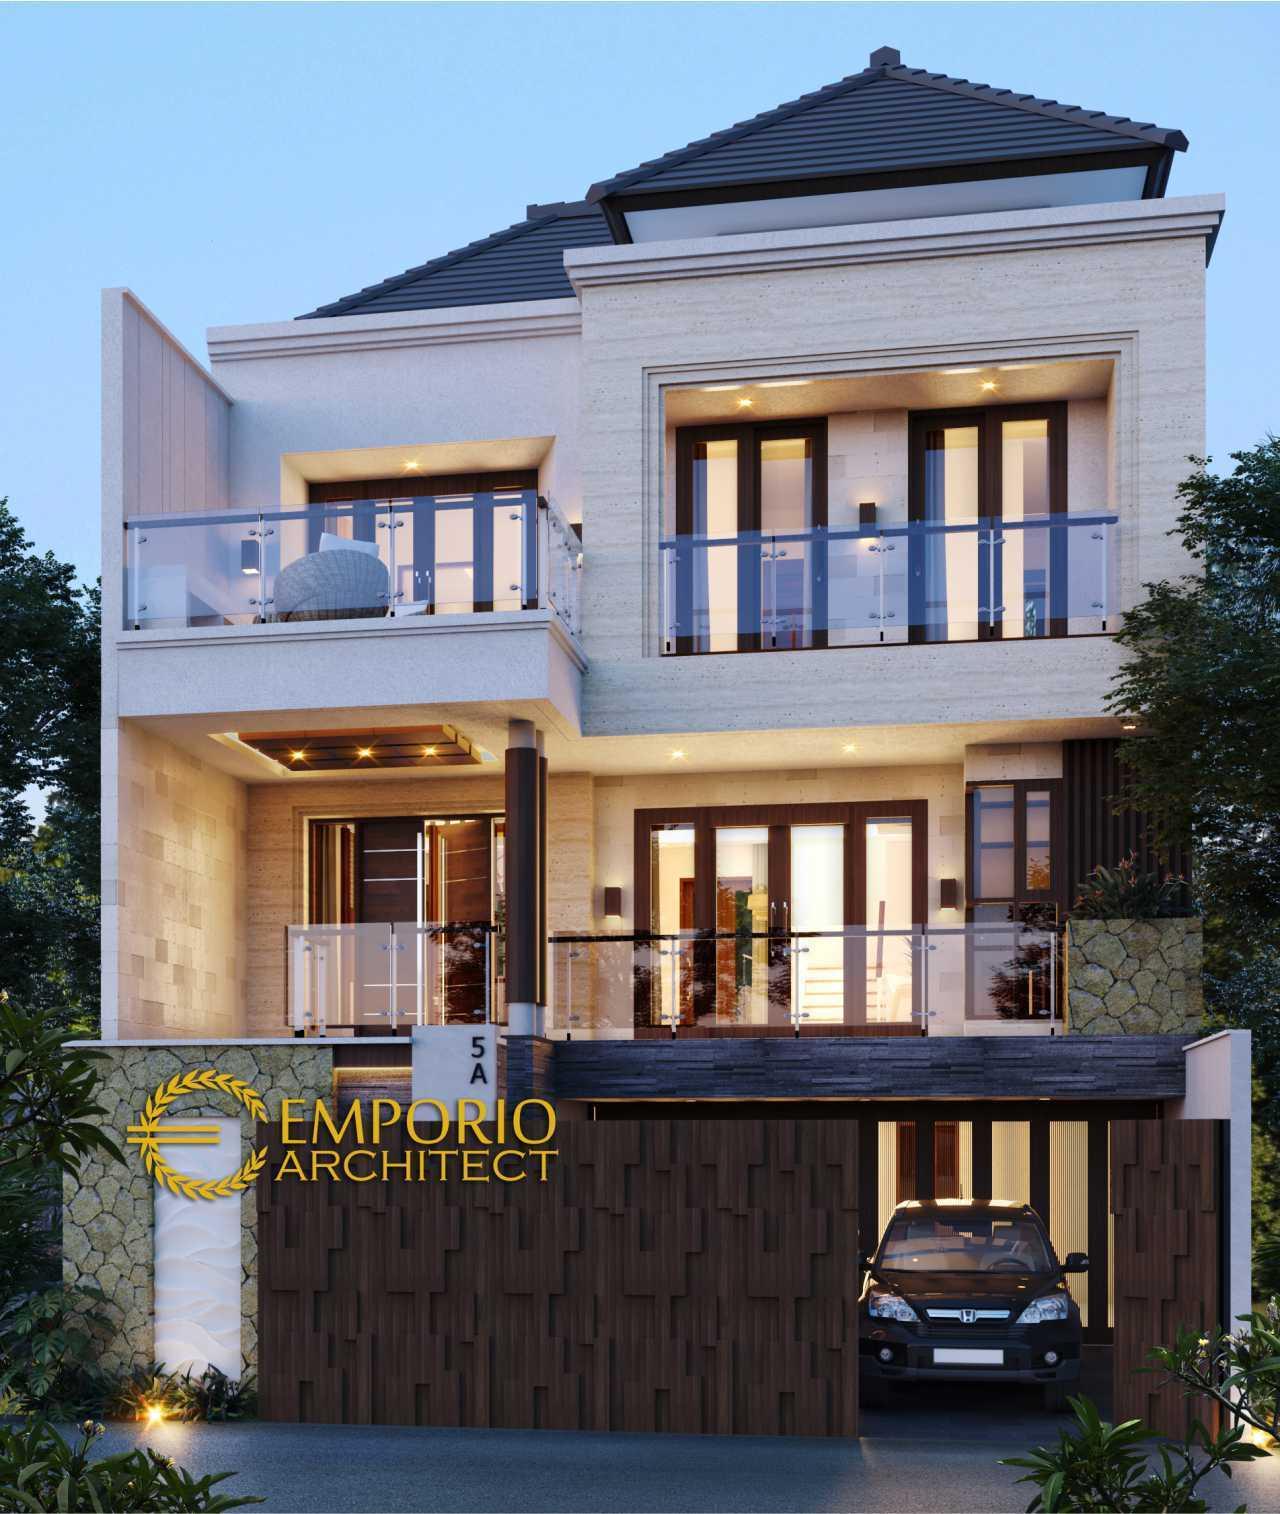 Emporio Architect Jasa Arsitek Denpasar Desain Rumah Modern Tropis 734 @ Denpasar, Bali Kota Denpasar, Bali, Indonesia Kota Denpasar, Bali, Indonesia Emporio-Architect-Jasa-Arsitek-Denpasar-Desain-Rumah-Modern-Tropis-734-Denpasar-Bali Modern 85478